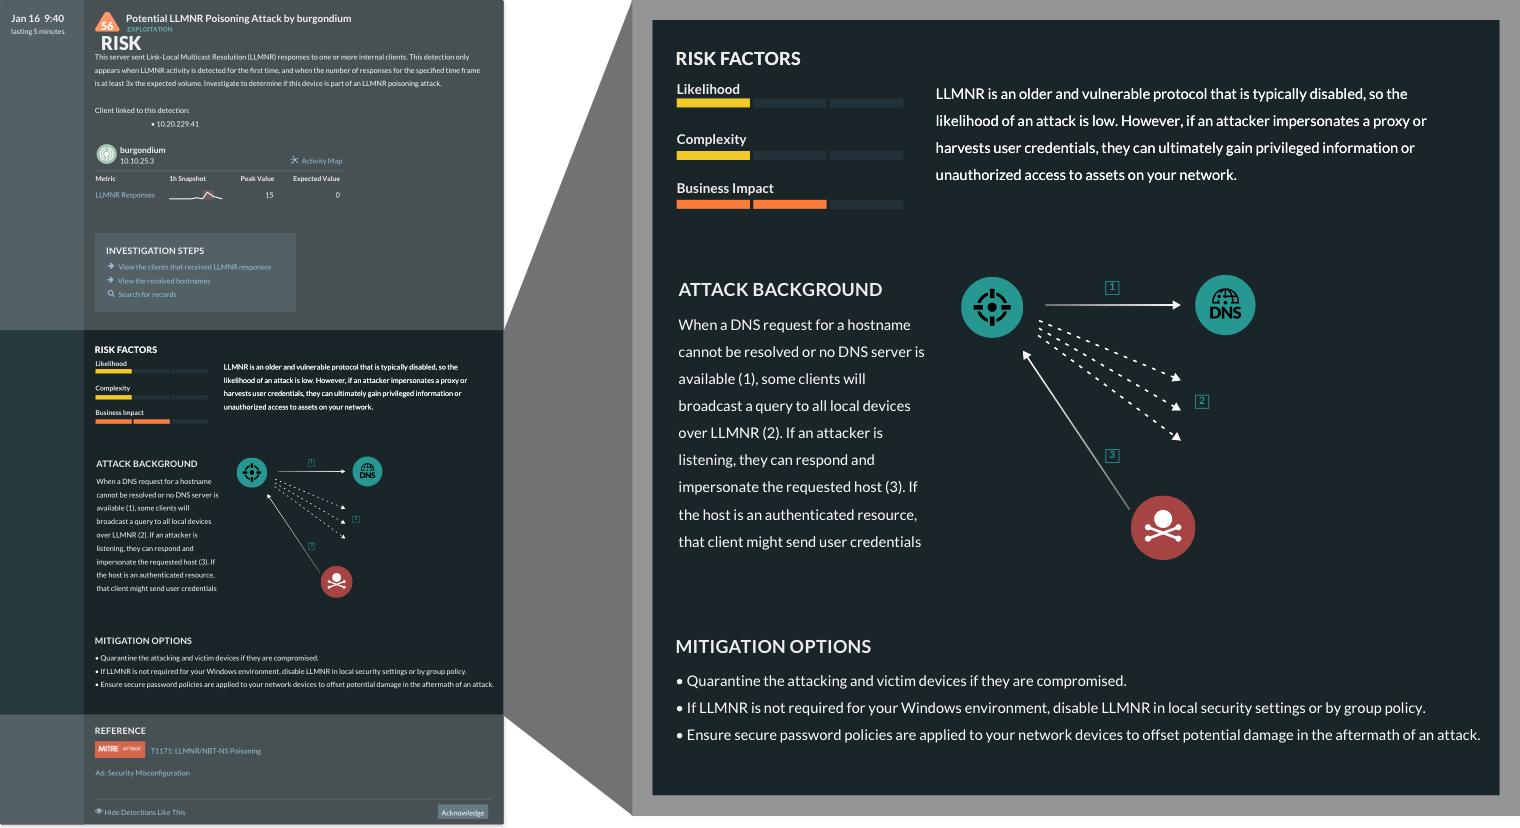 Attack Background & Mitigation Options